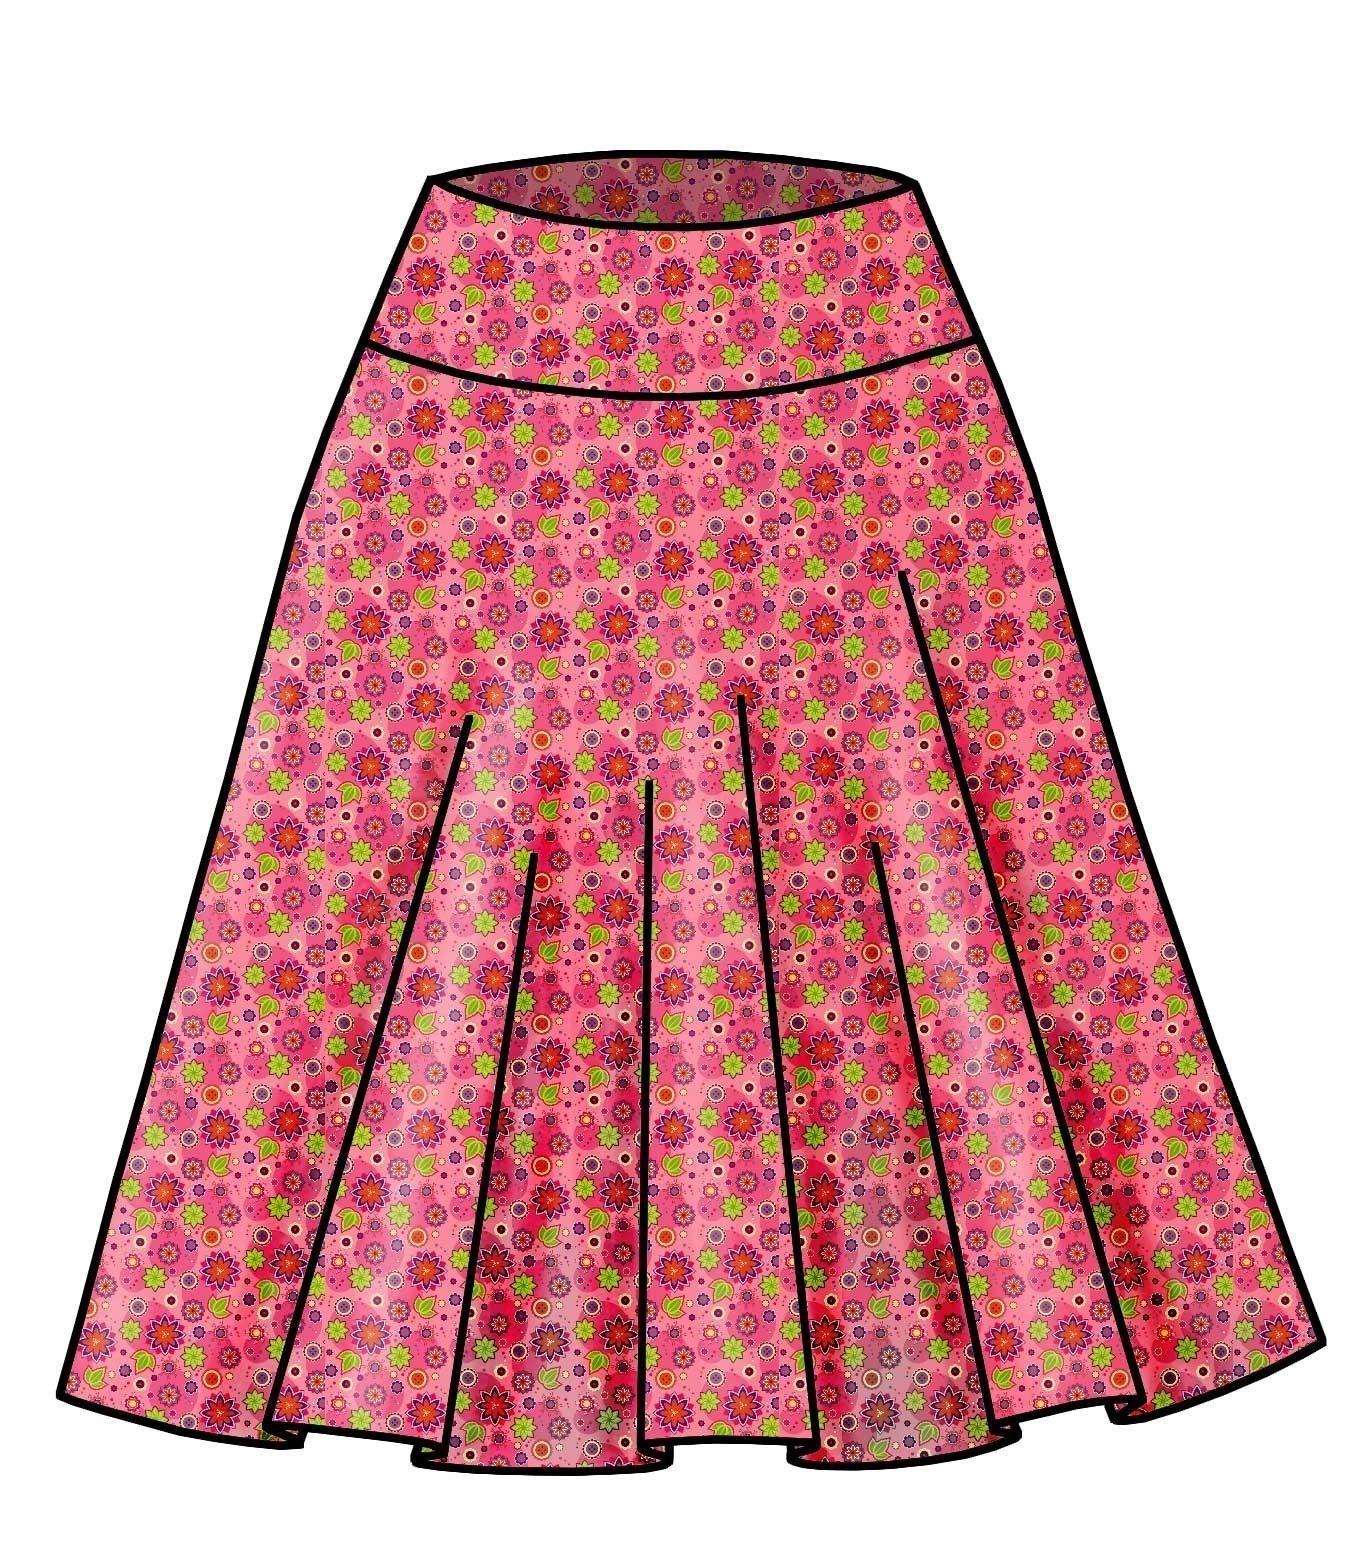 Skirt clipart Unique Skirt Clipart Free Download Clip Art.